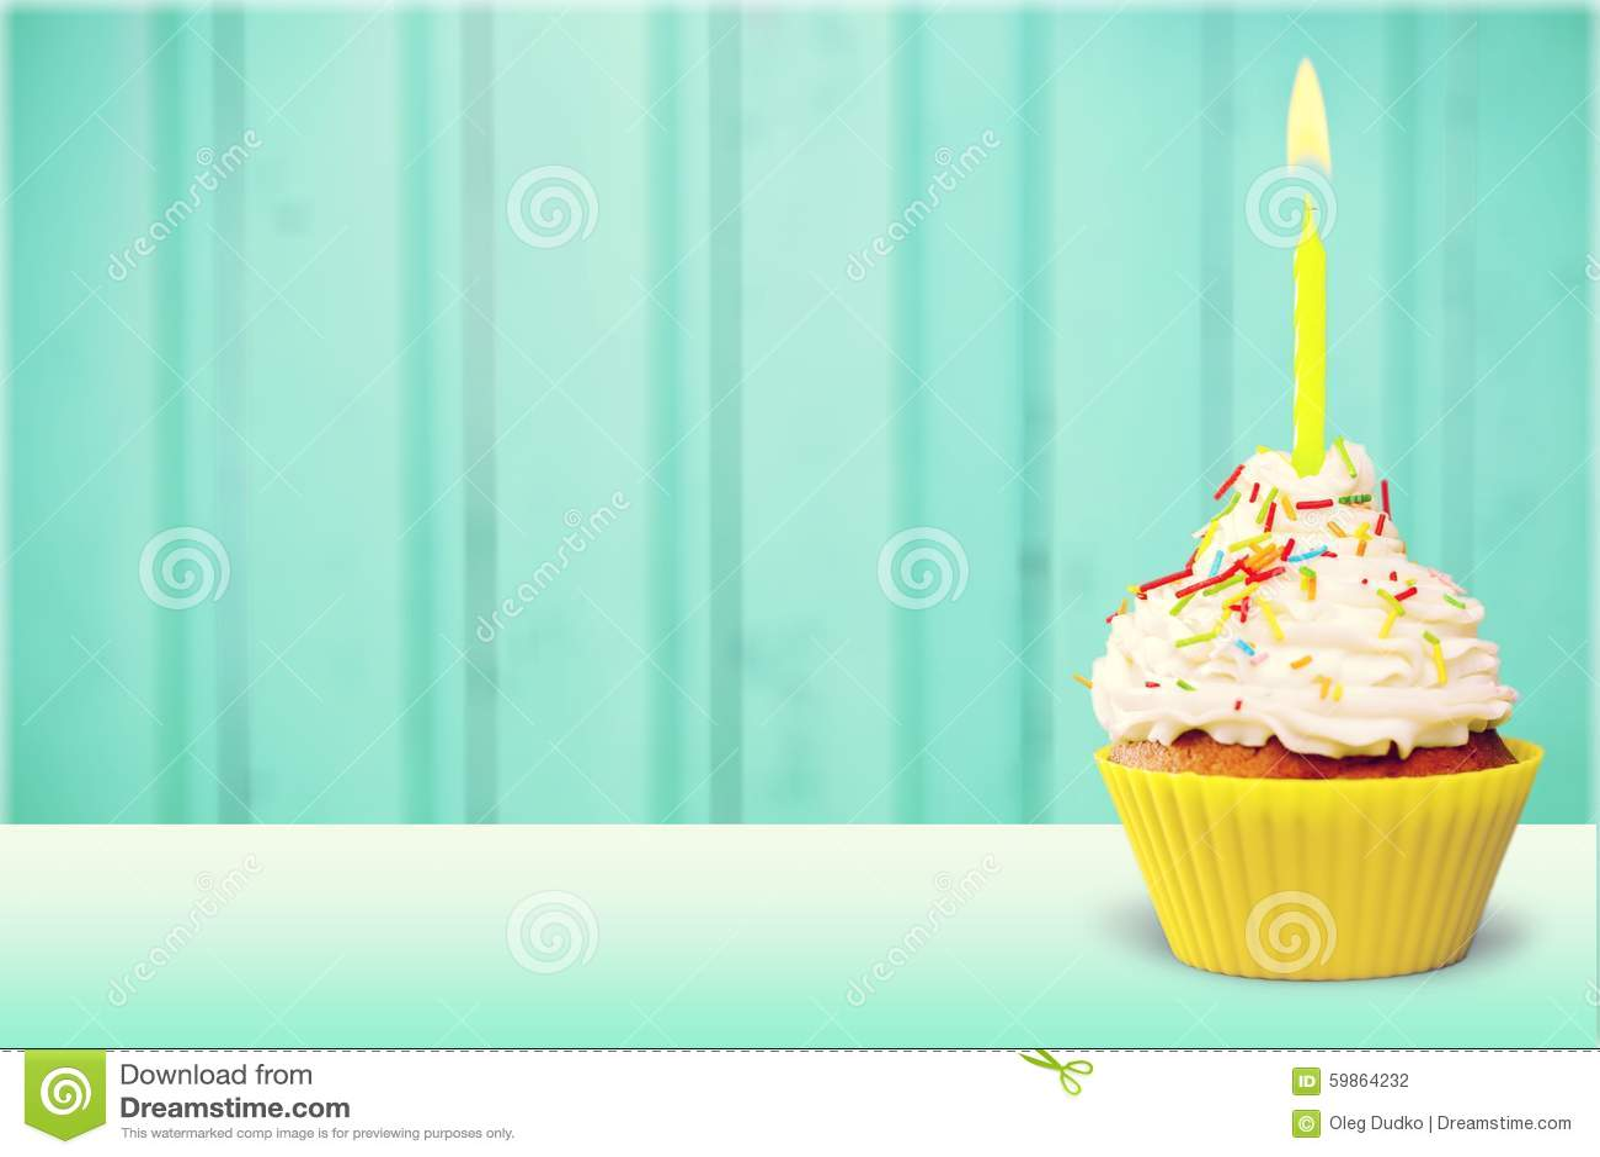 Capcake d anniversaire